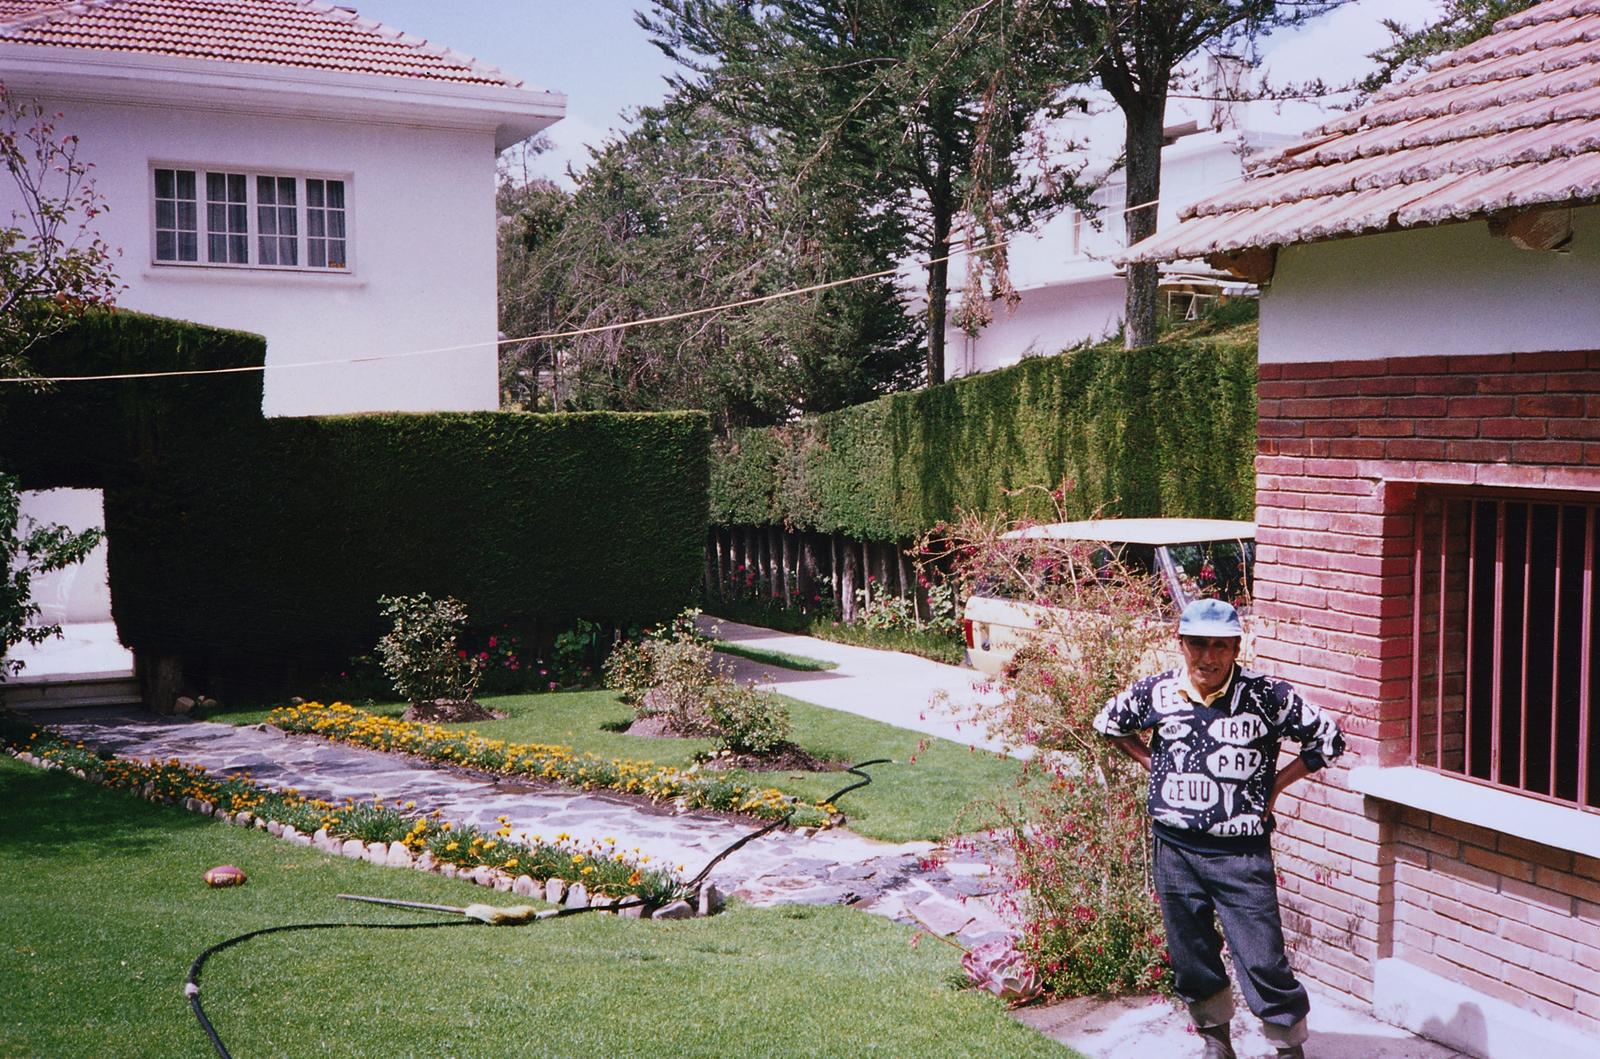 La Paz - Executive Level Position Residence - 1992